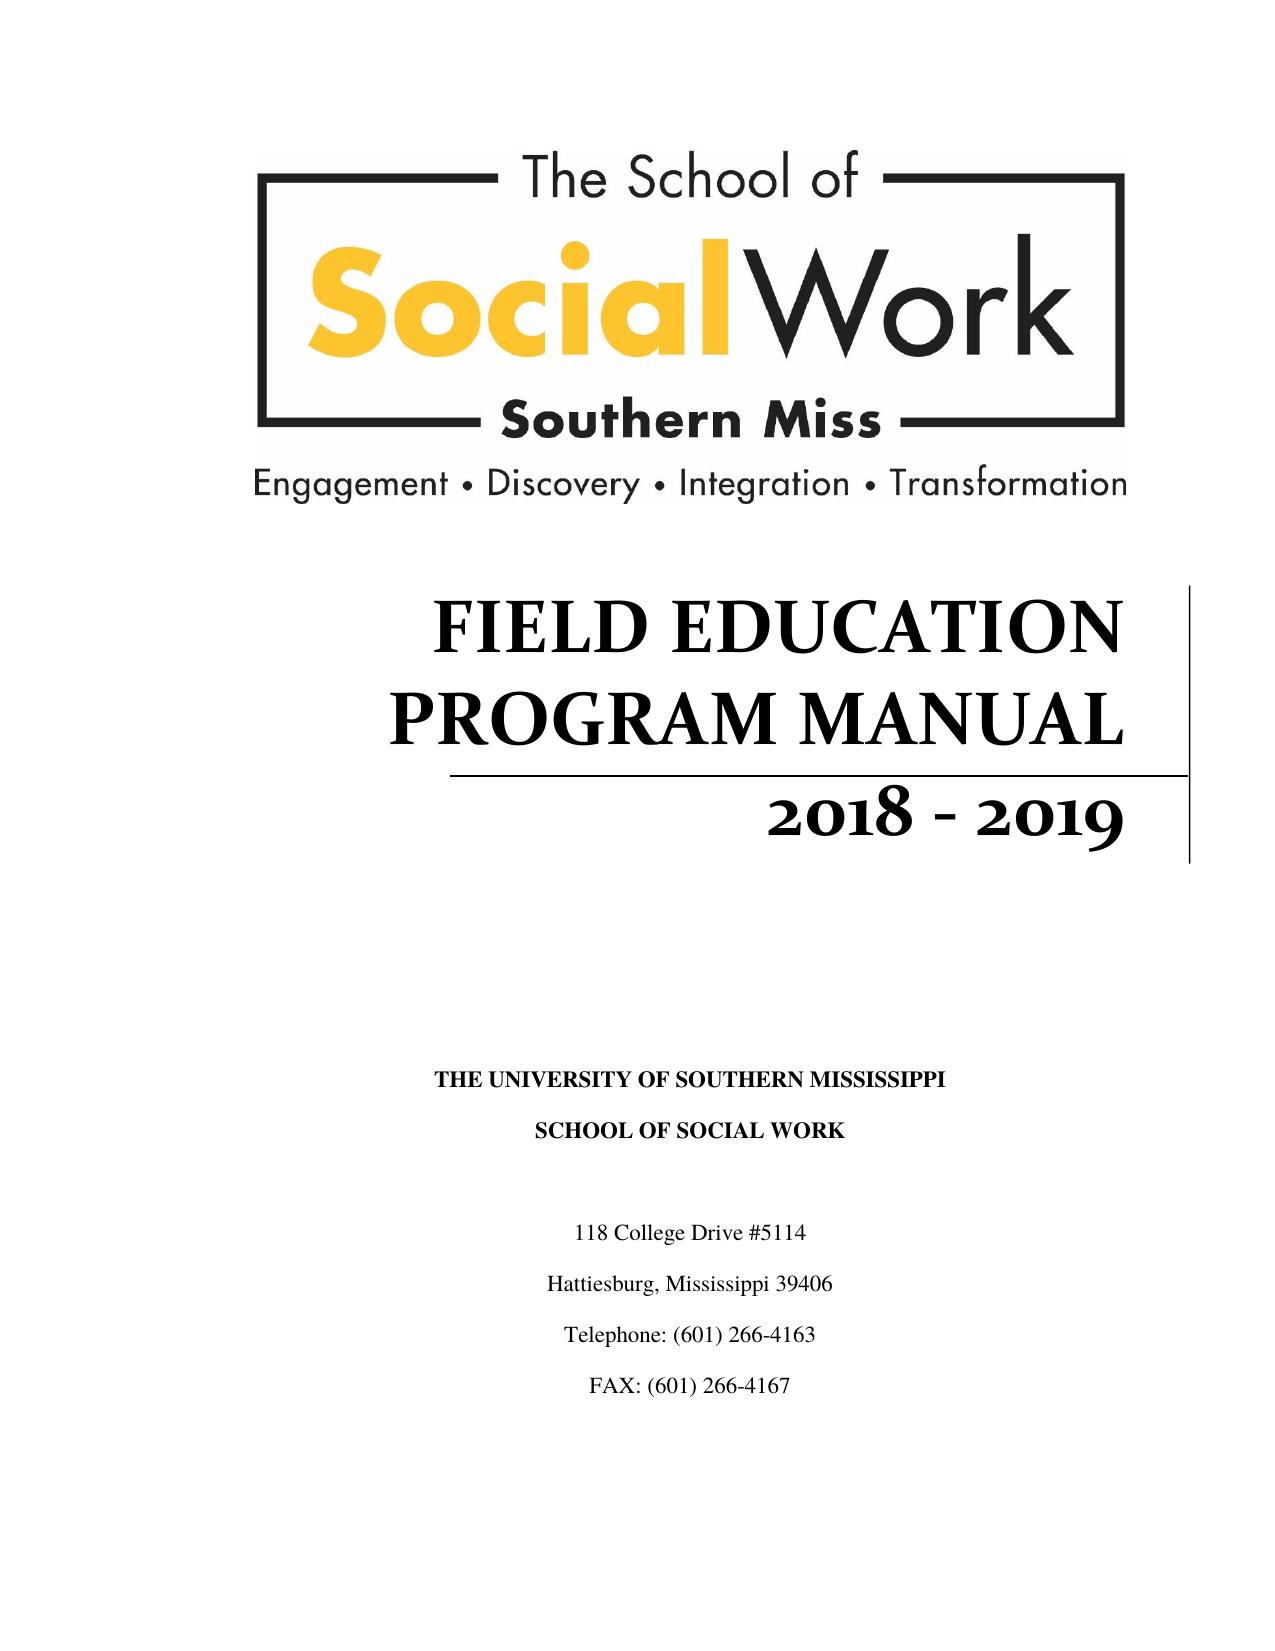 Field Education Program Manual 2018